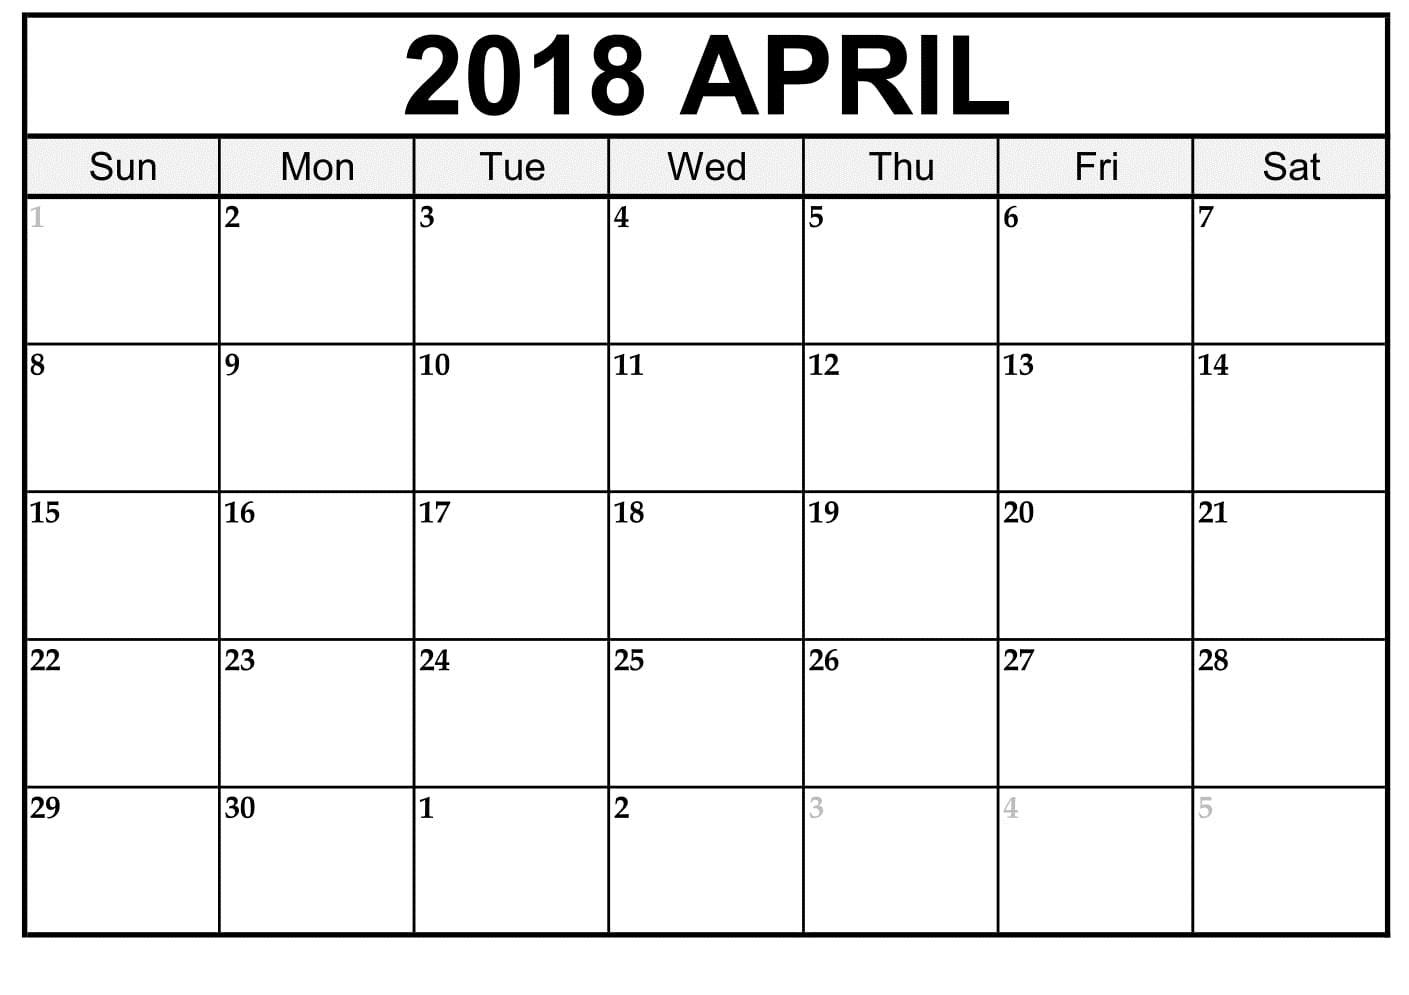 november 2018 appointment calendar